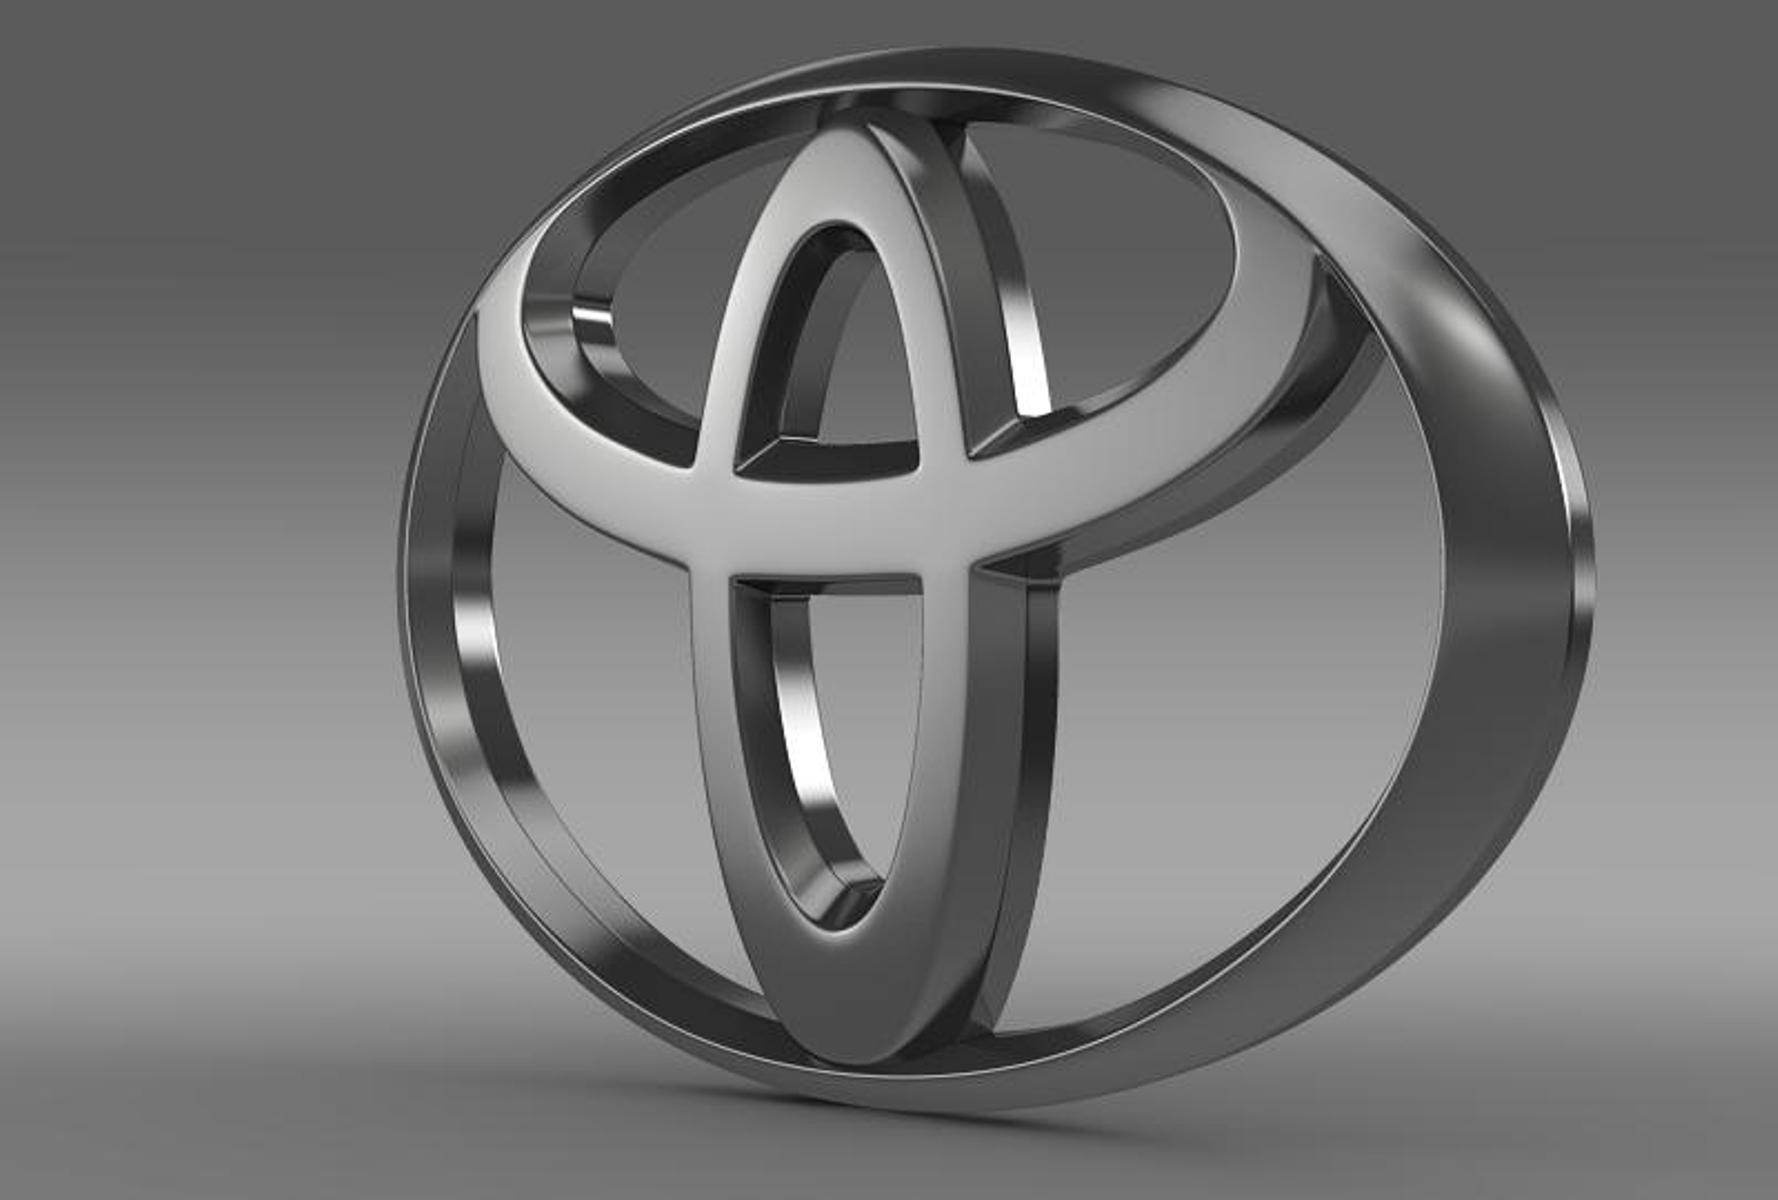 Toyota Wallpaper 3D Logo Logo Wallpapers HD   Wallpapers HD 1778x1200